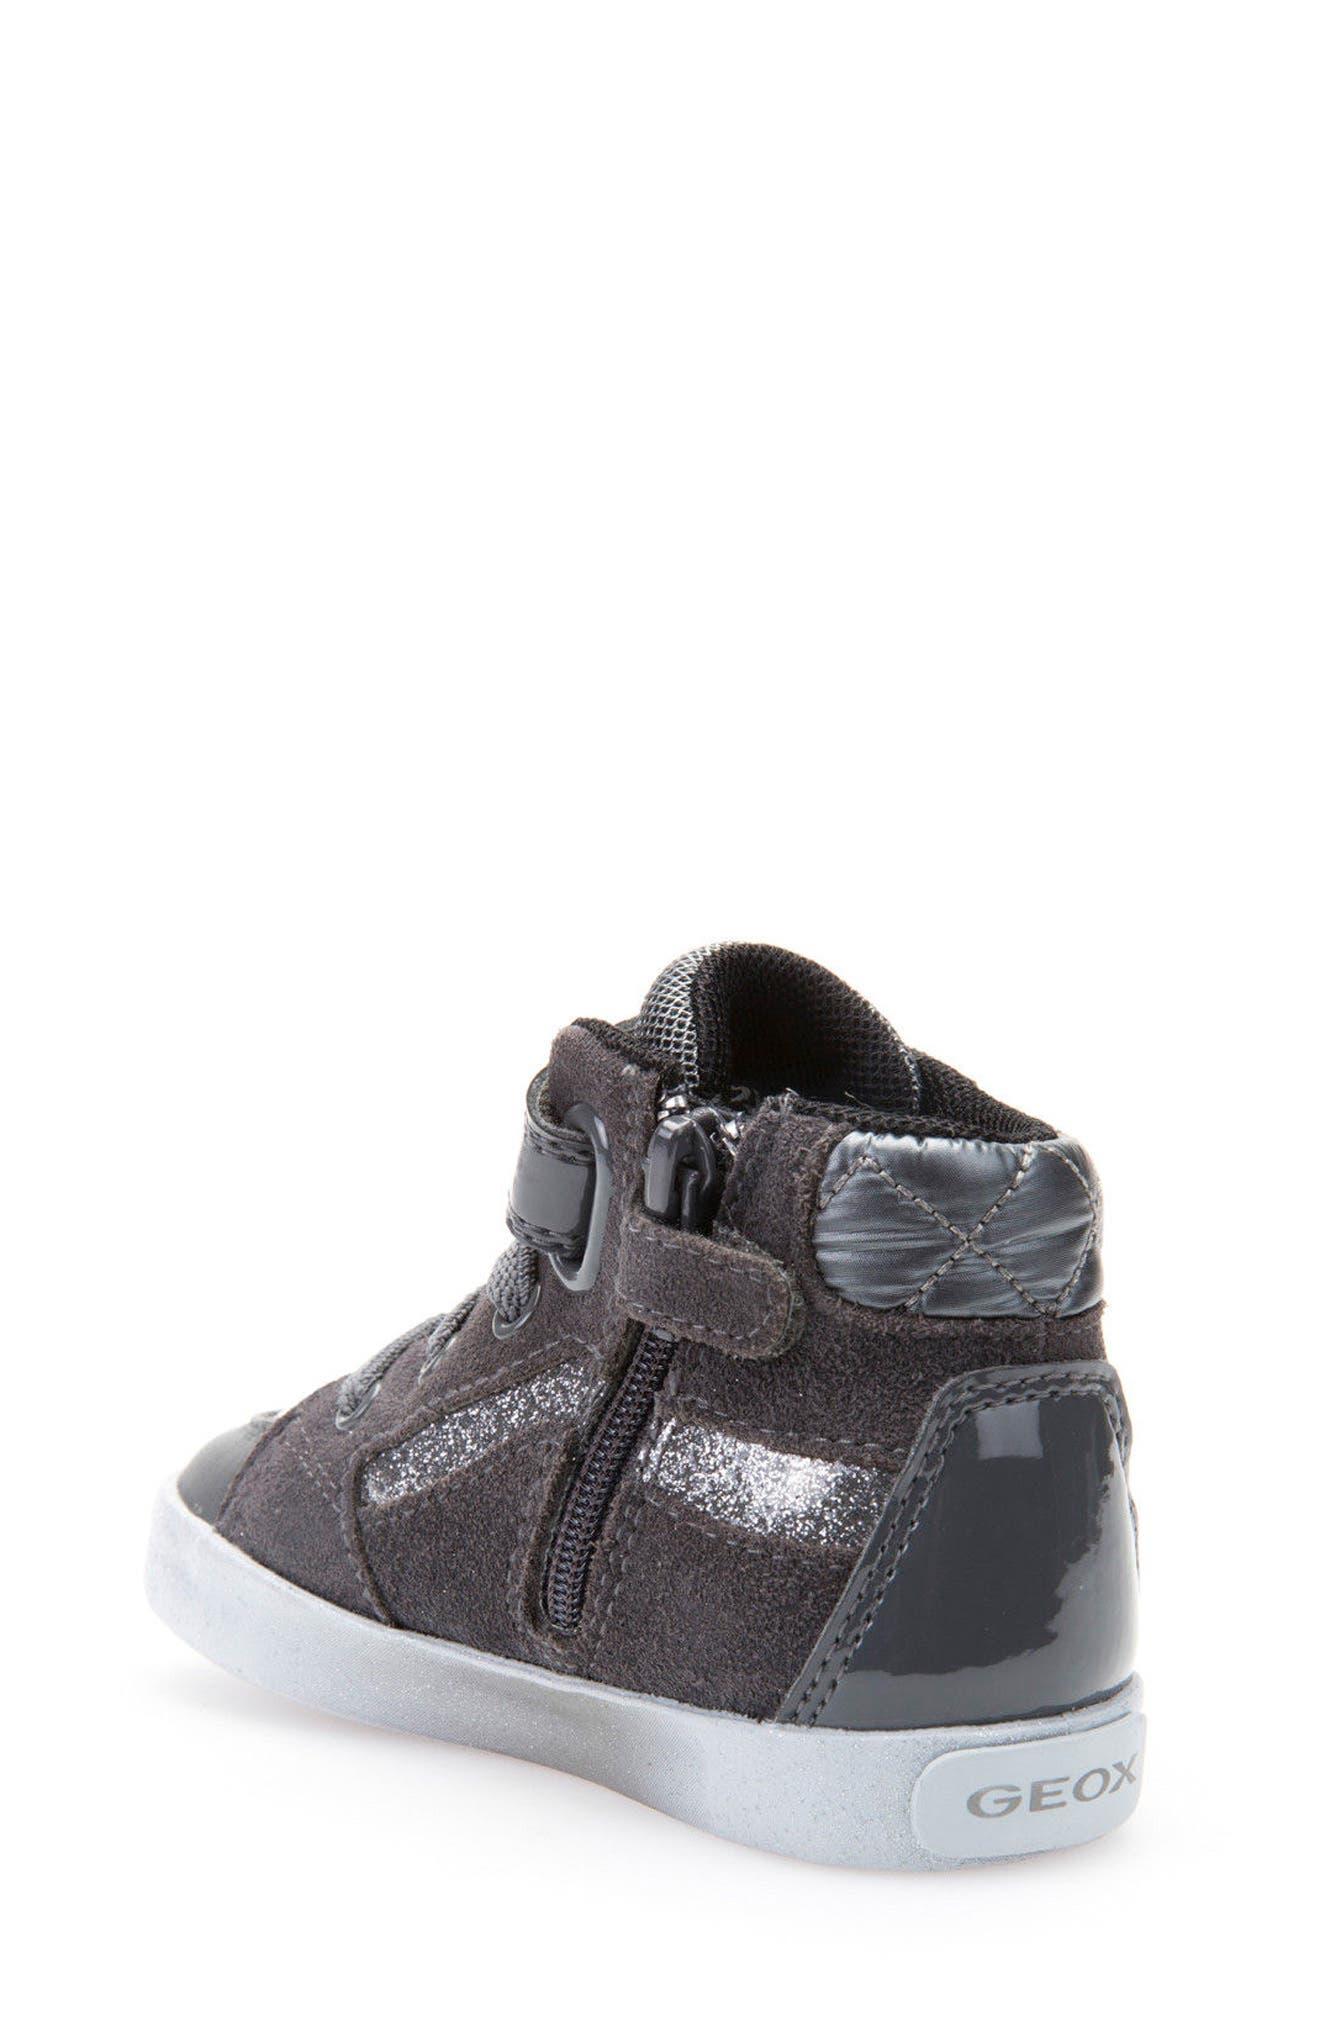 Kiwi Studded High Top Sneaker,                             Alternate thumbnail 2, color,                             020